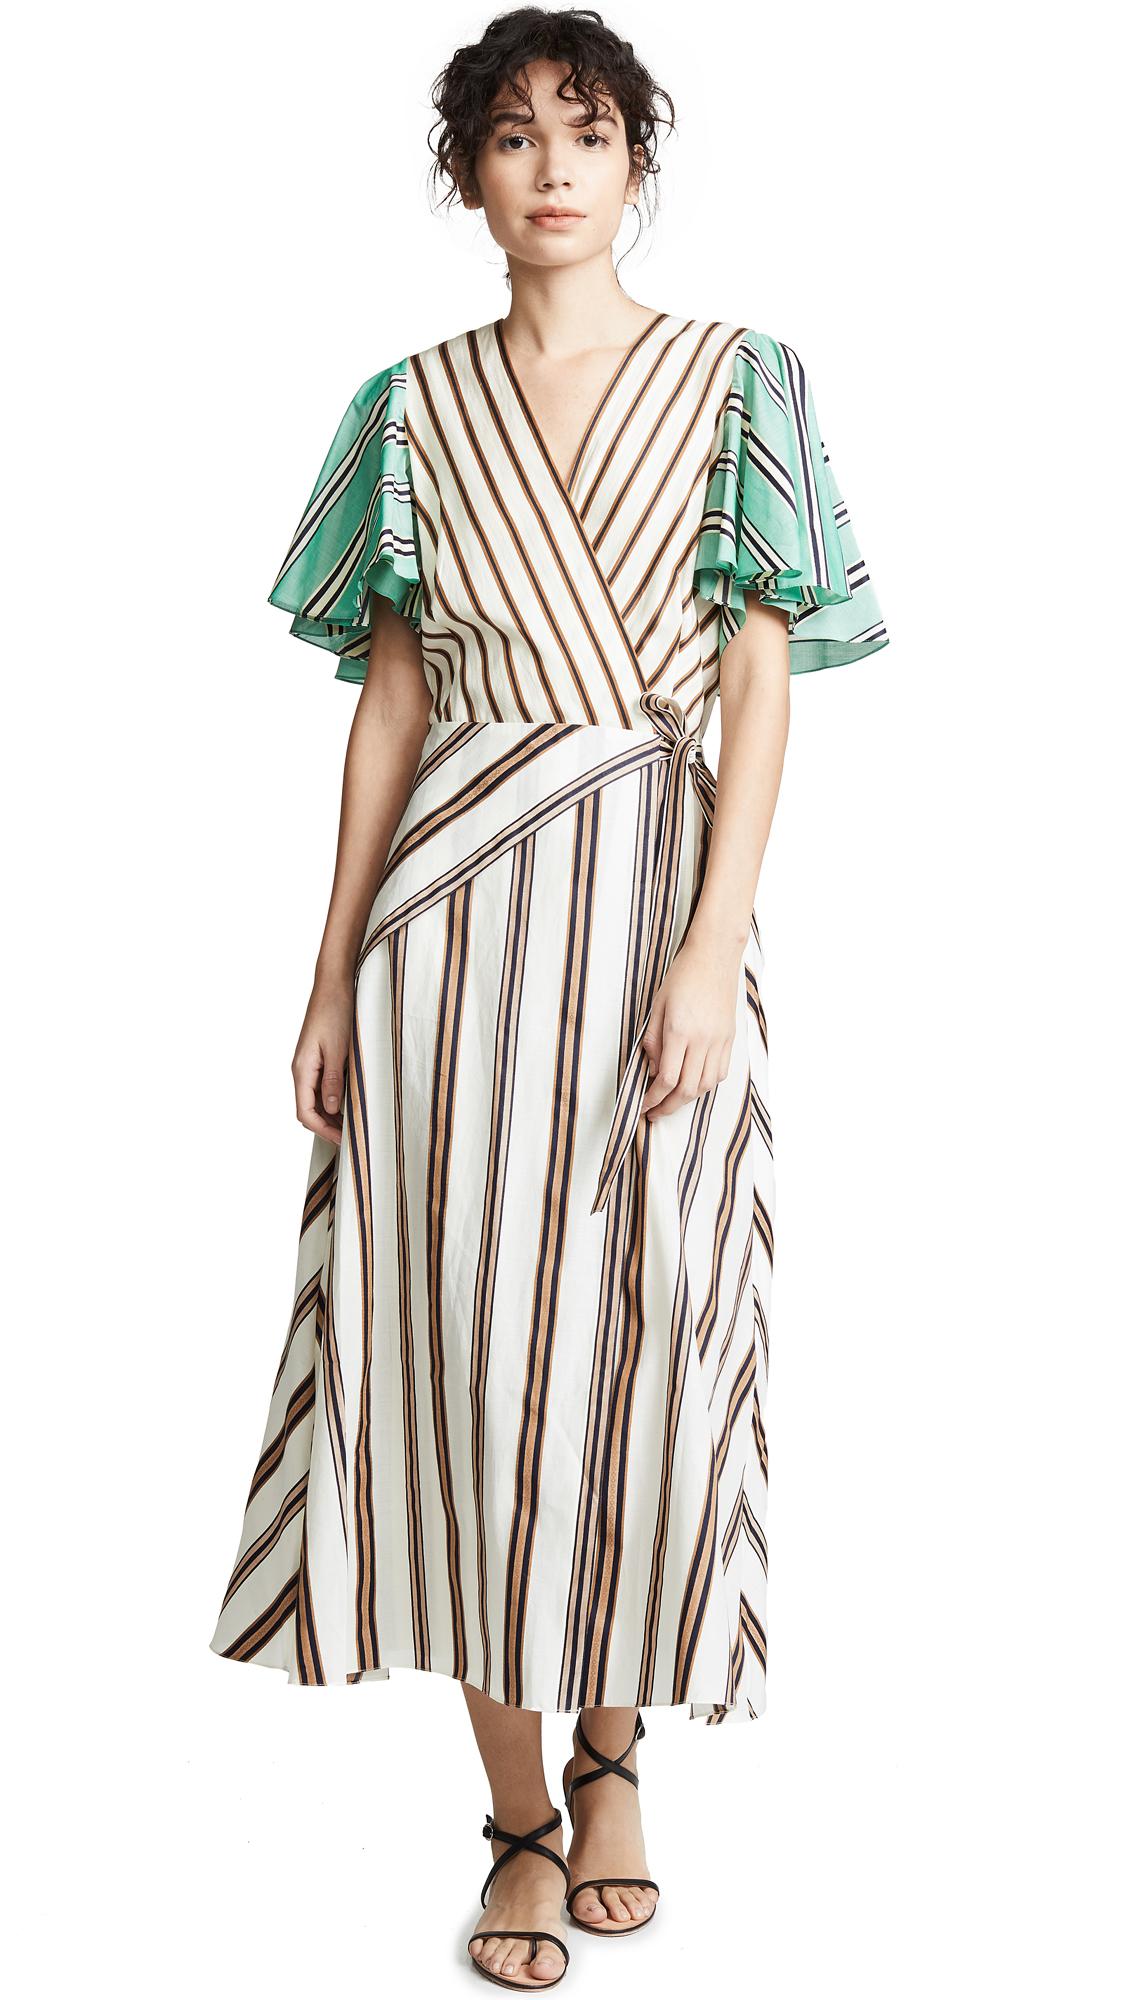 Anna October Mixed Stripe Dress In White/Tan/Teal Stripe